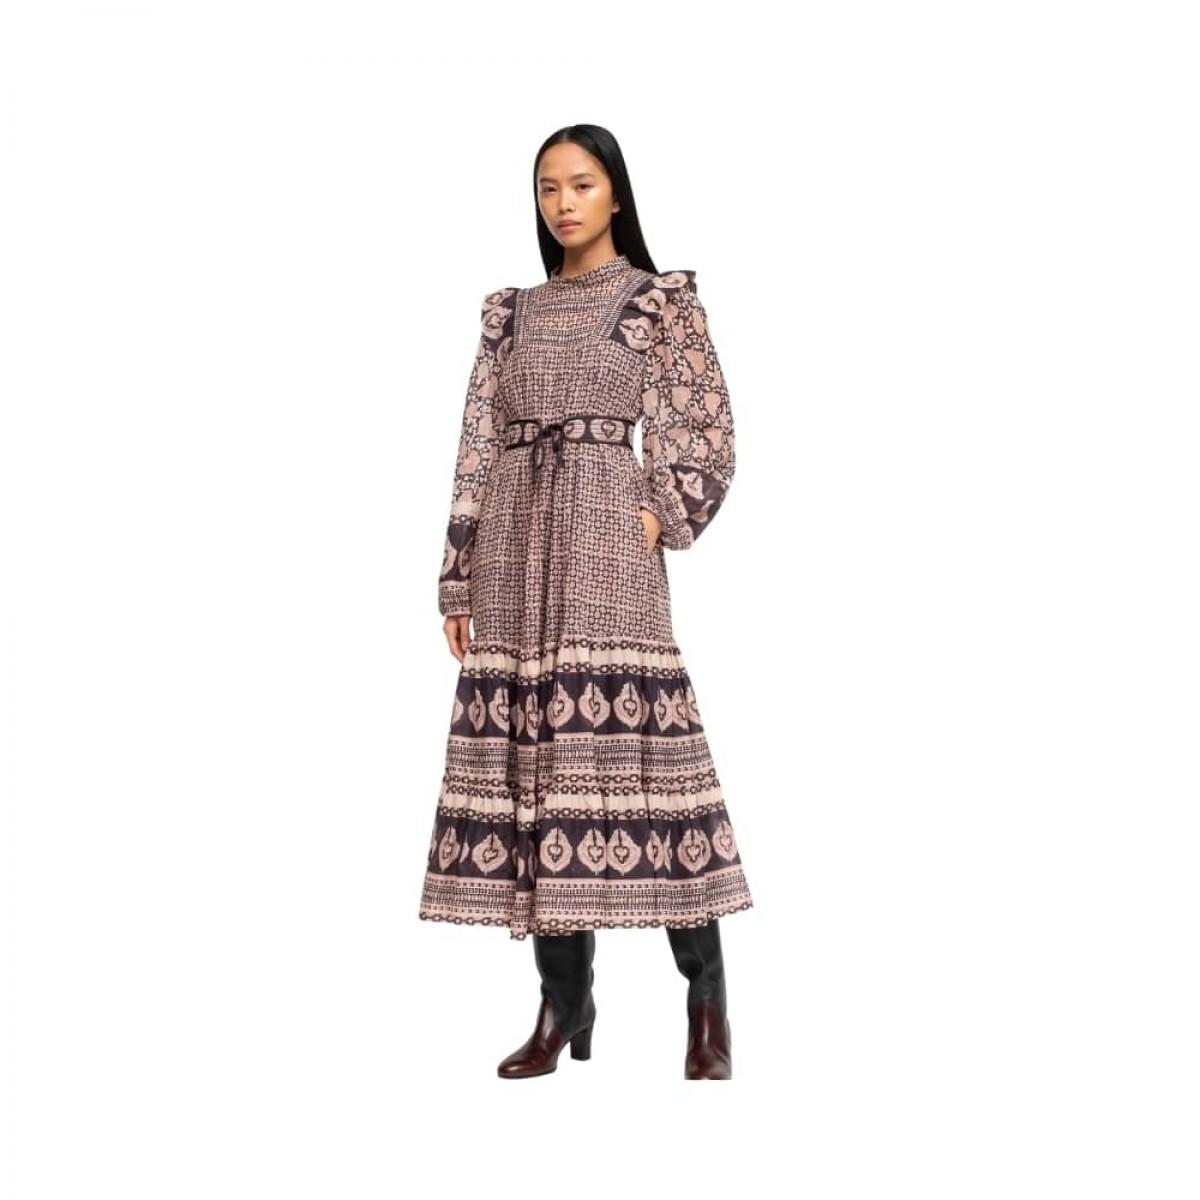 margo border dress - lilac